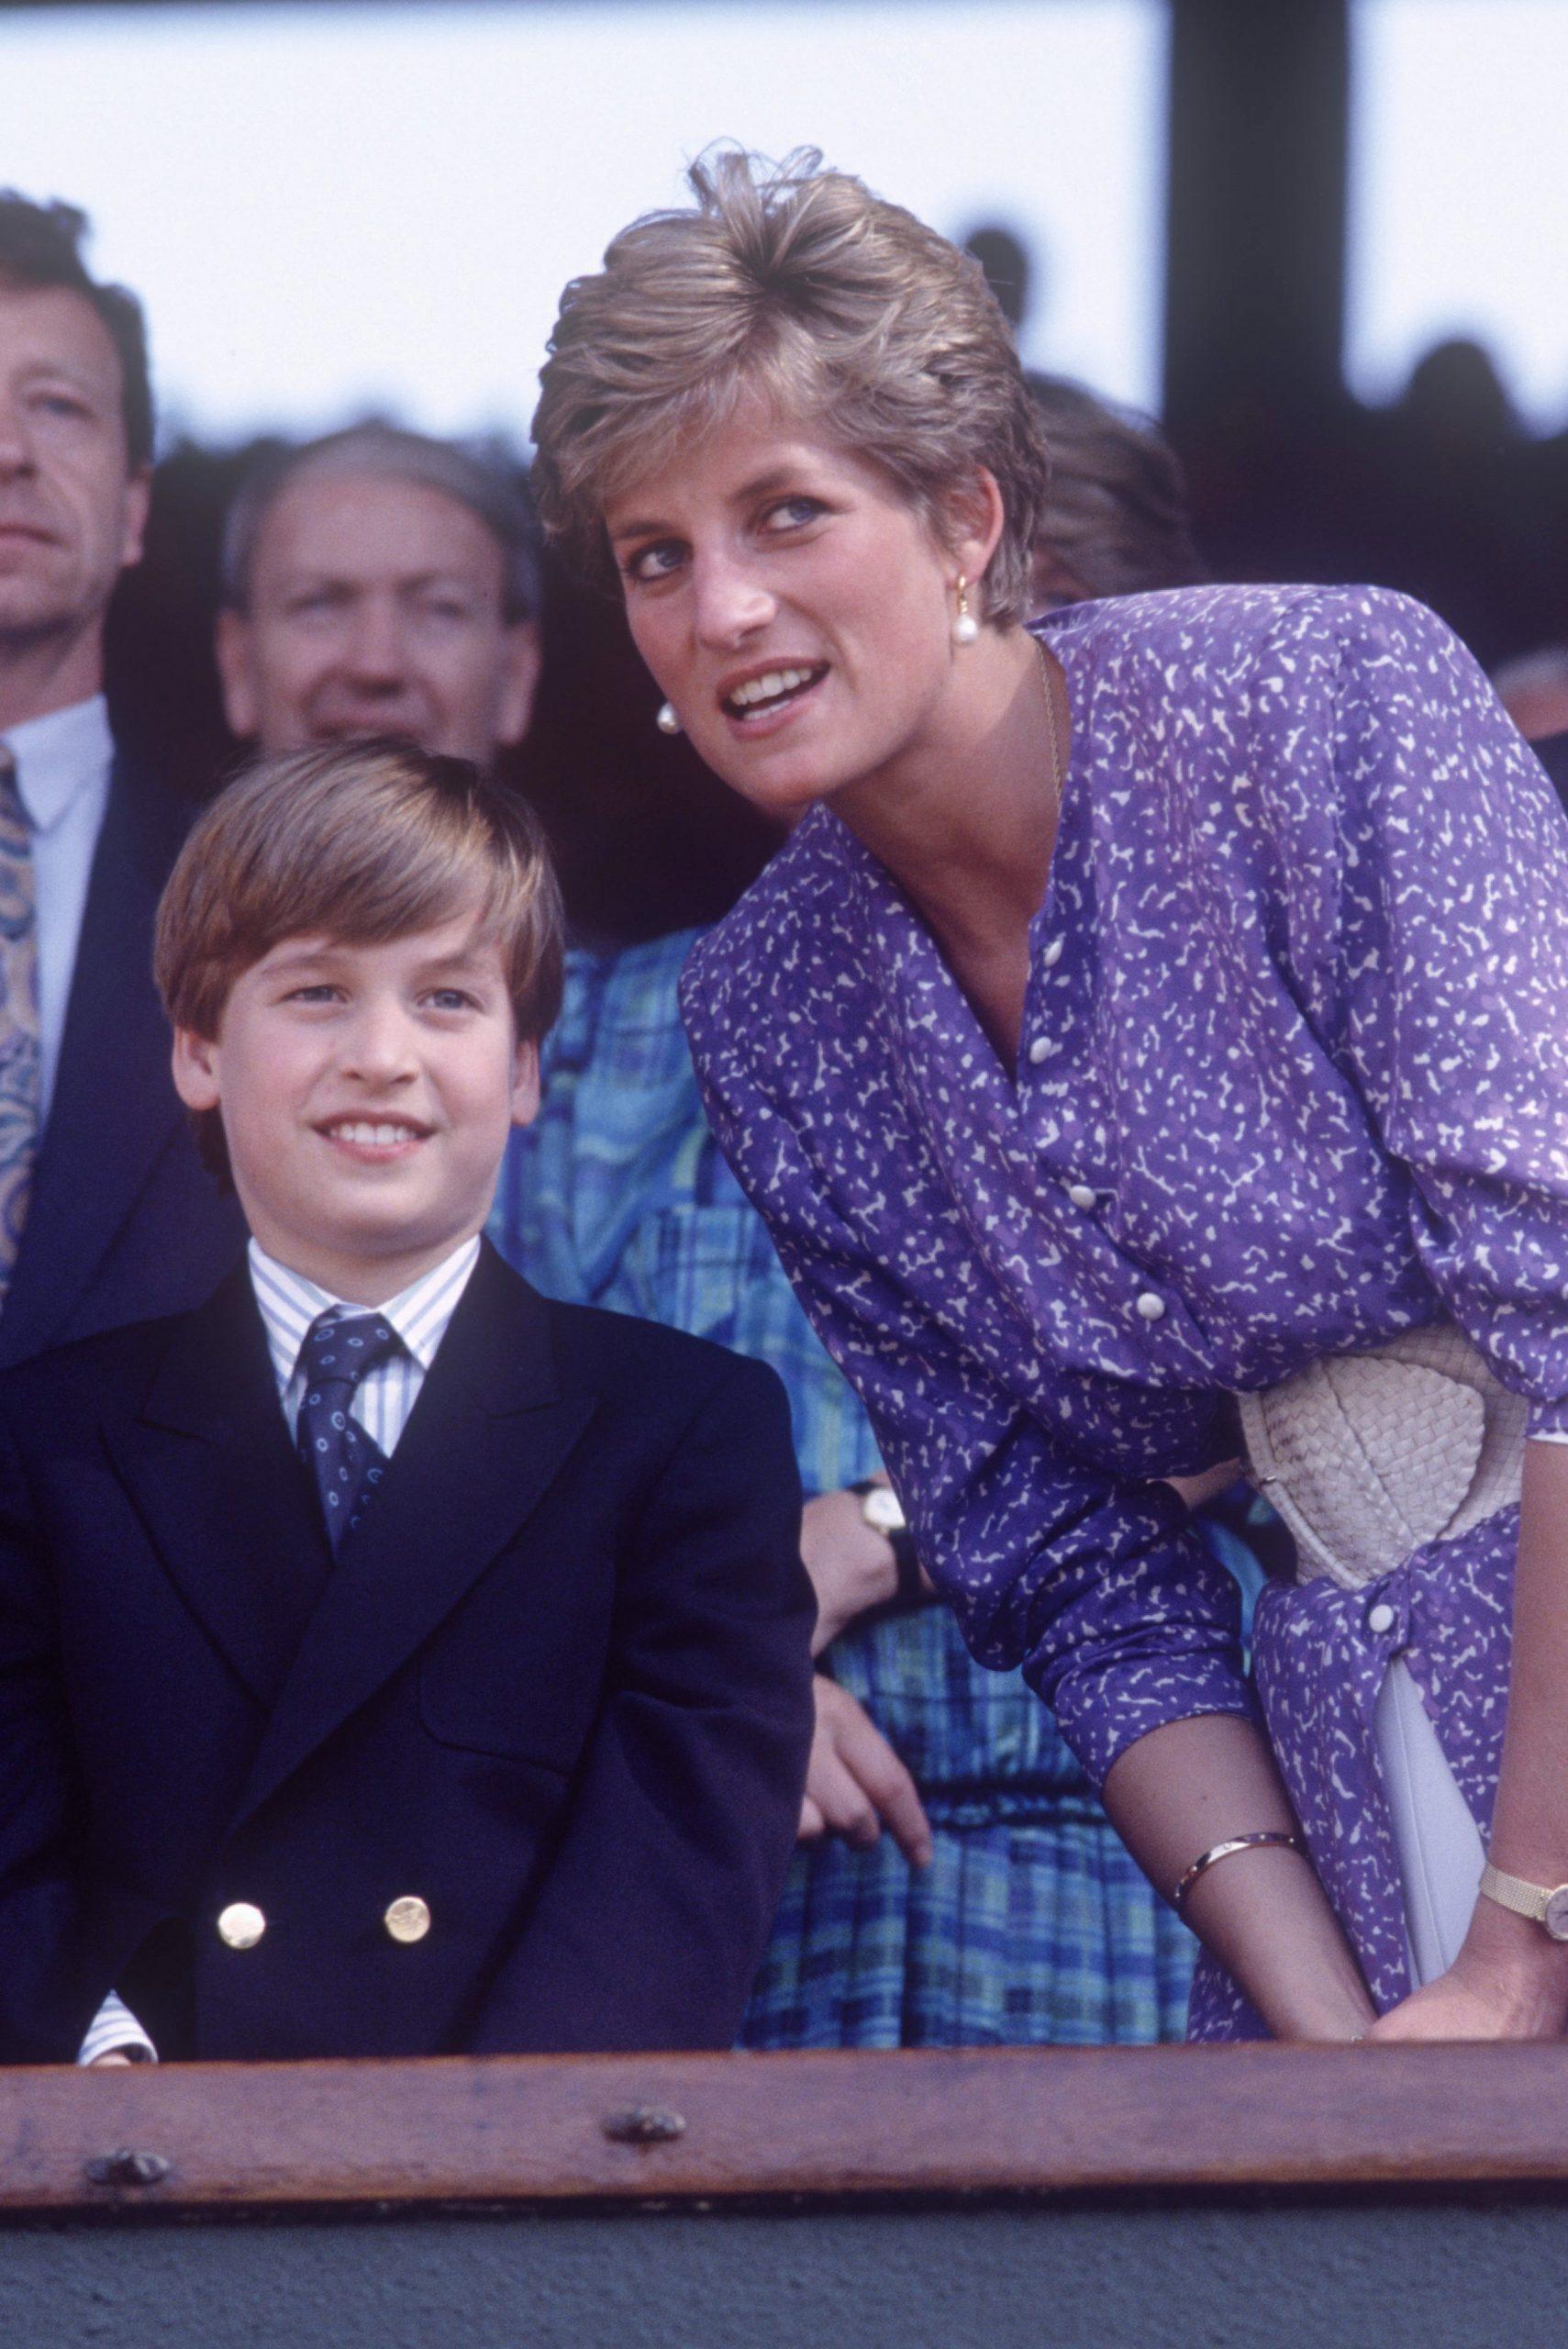 Prince William and Princess Diana